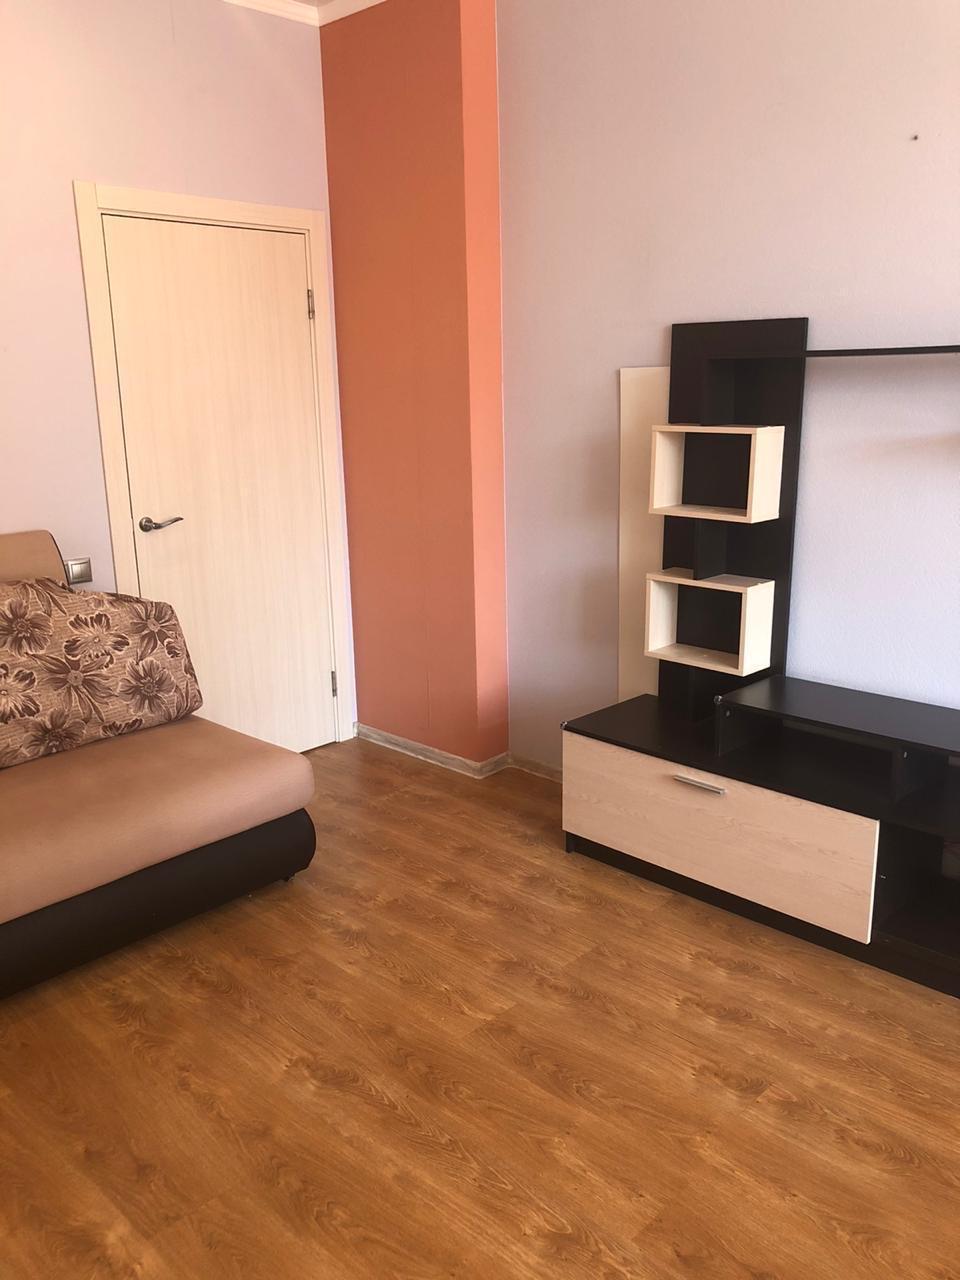 Квартира, 1 комната, 47 м² в Коммунарке 89055769697 купить 2